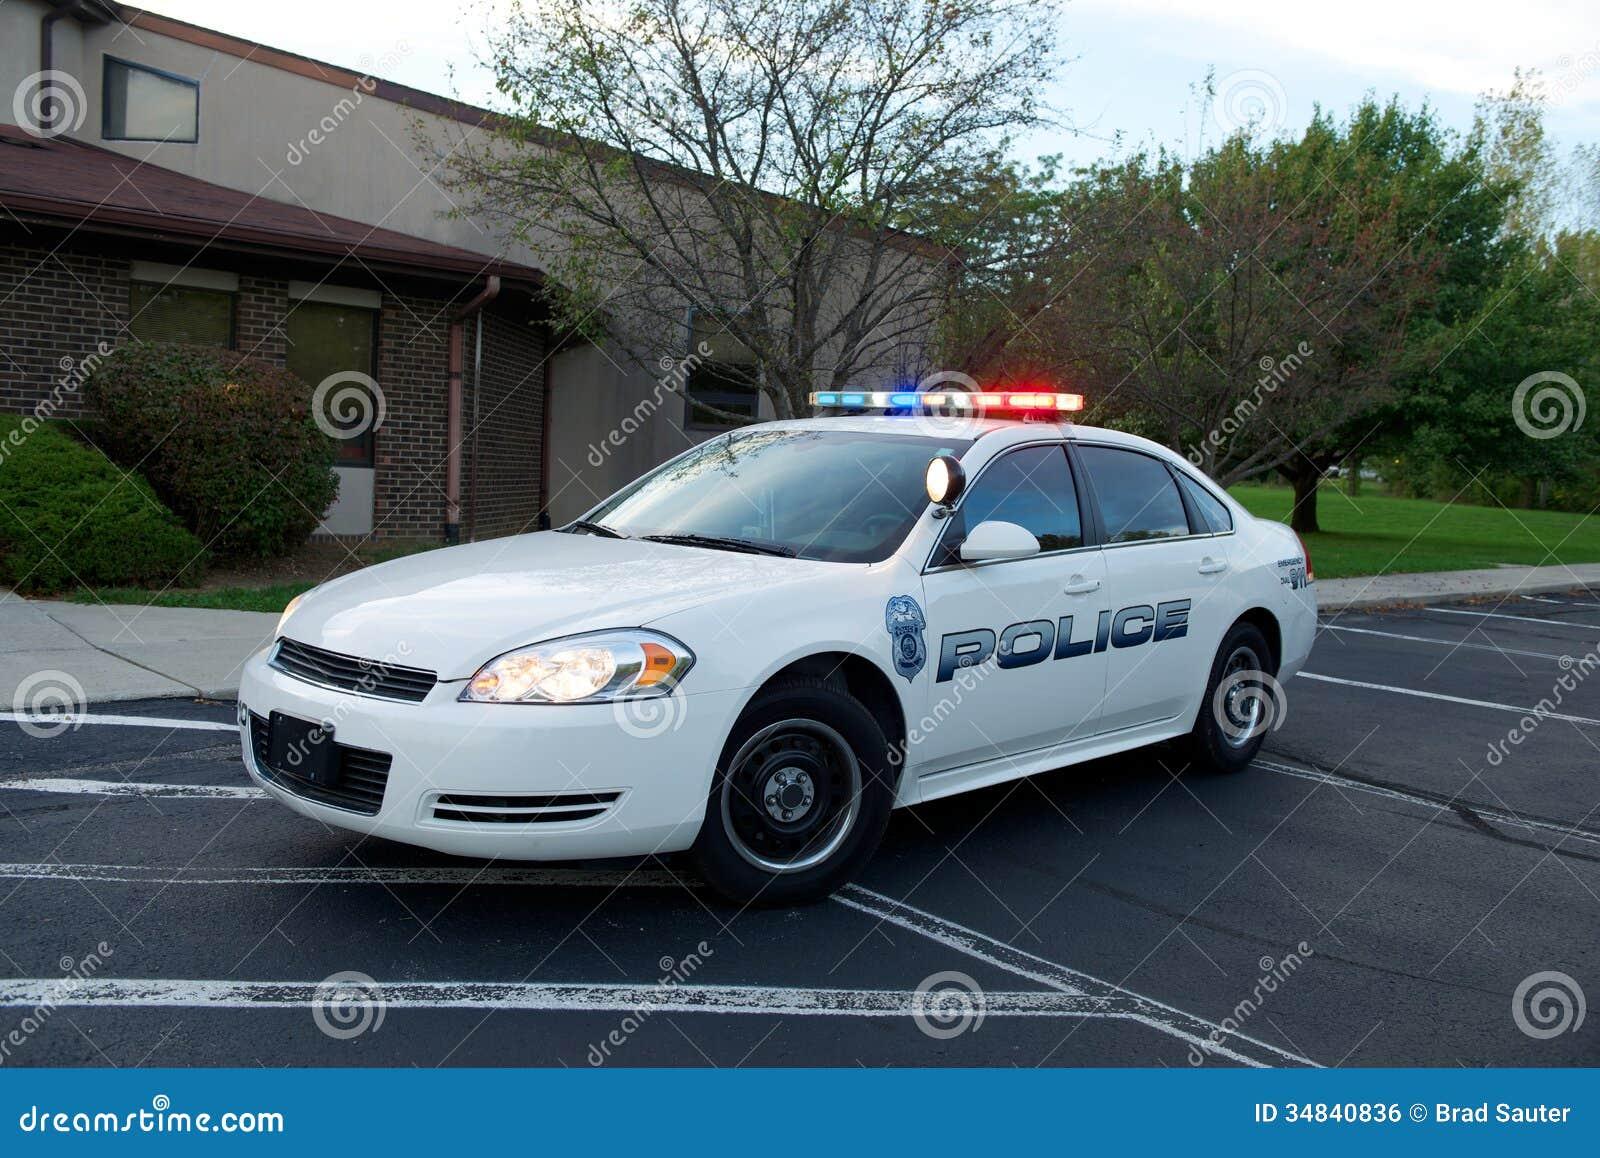 police car royalty free stock image image 34840836. Black Bedroom Furniture Sets. Home Design Ideas